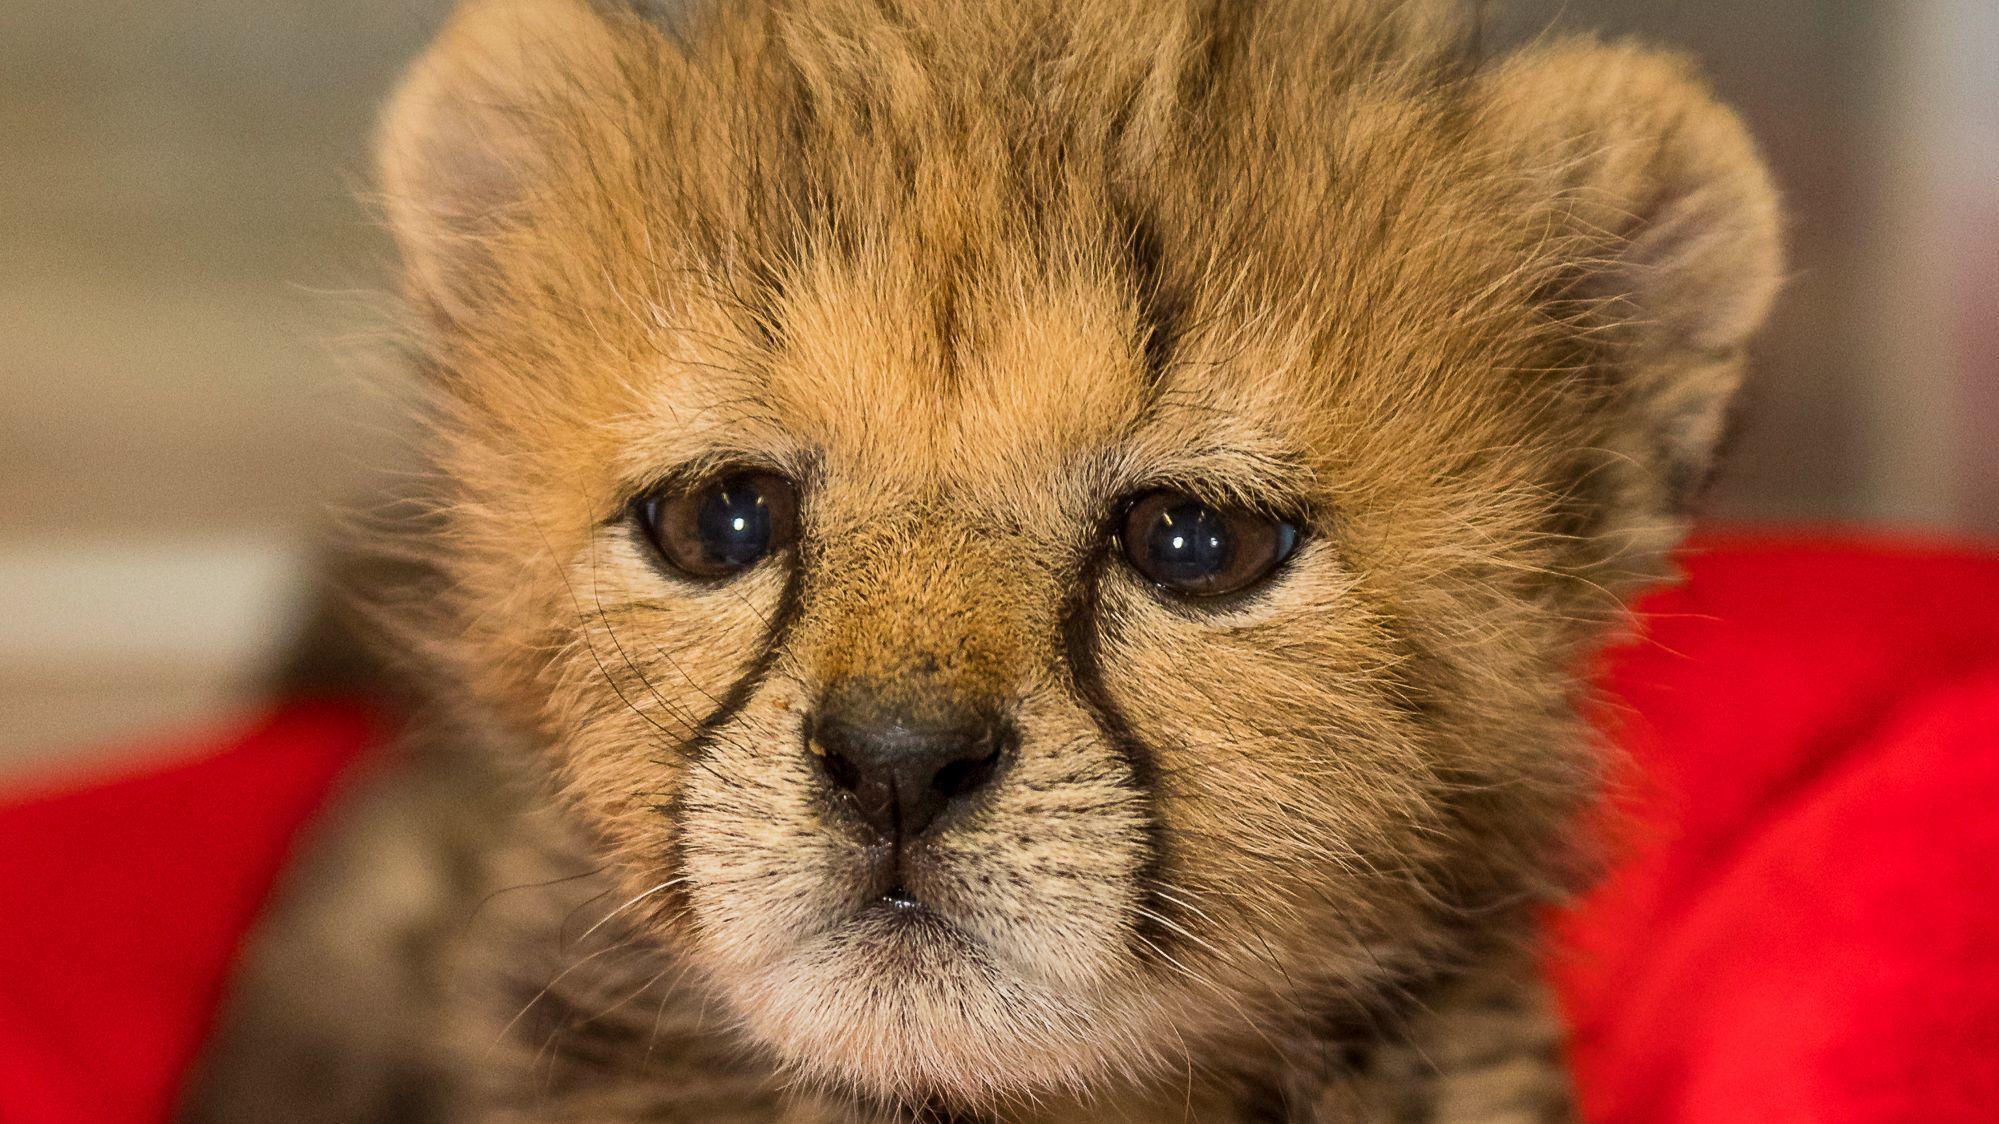 Cheetah Cub Brings New Energy To San Diego Zoo The San